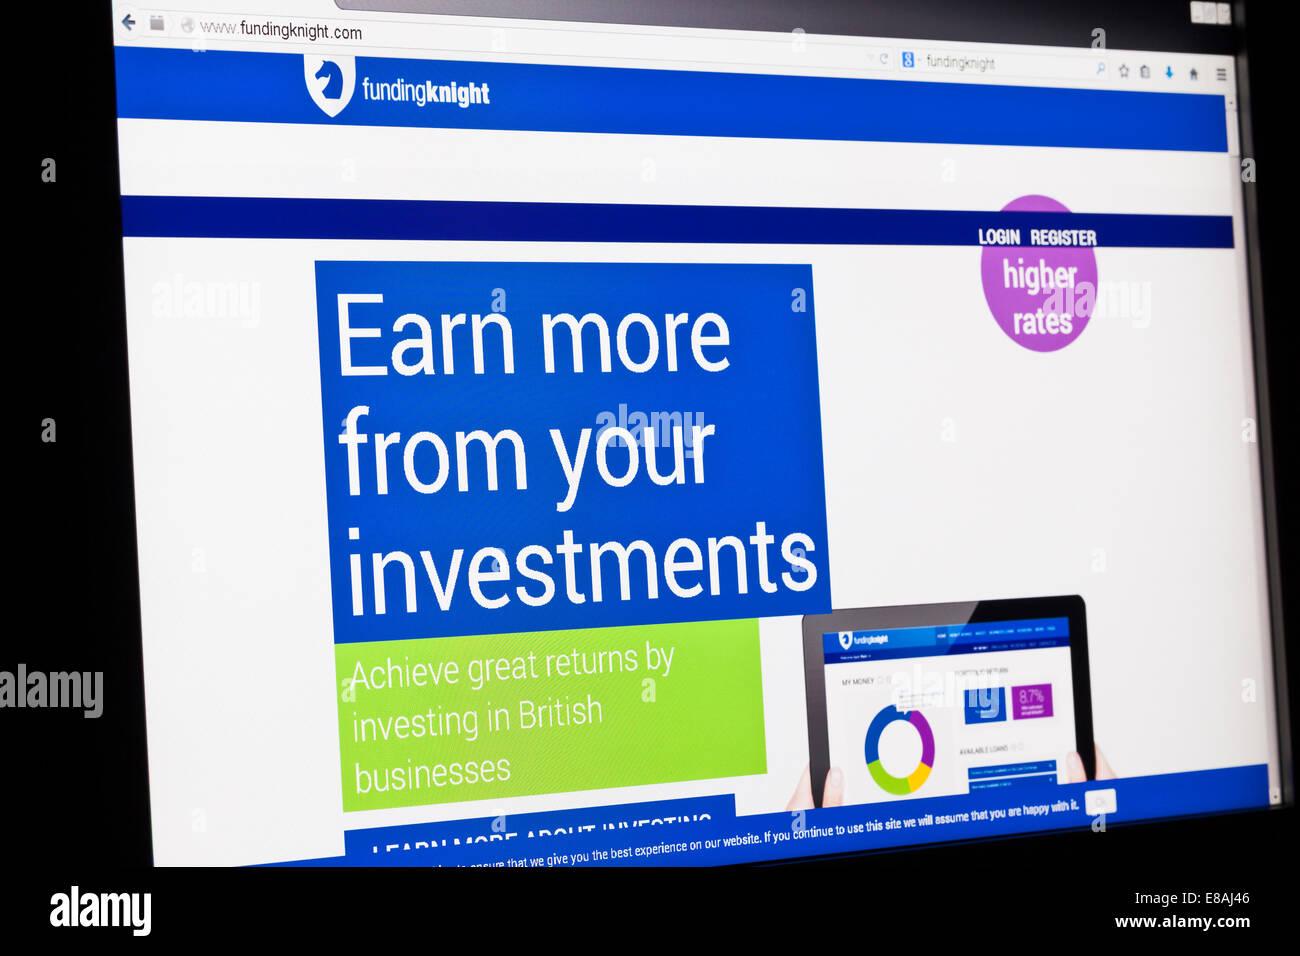 Screenshot of the funding knight homepage - Stock Image